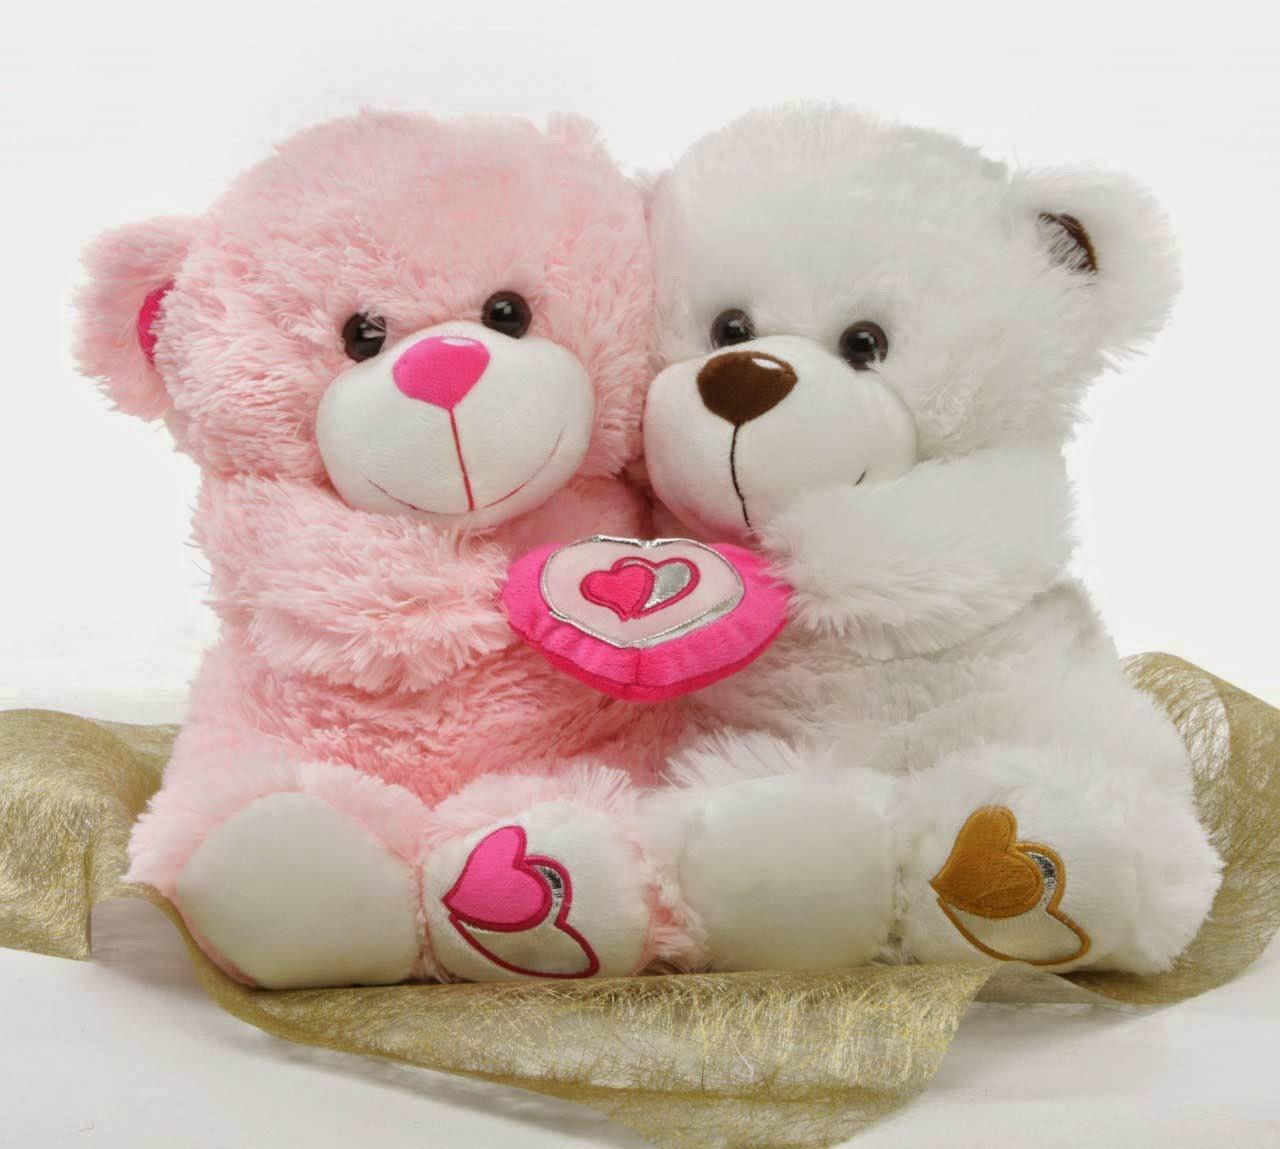 Cute Teddy Bear HD Image for Girlfriend & Boyfriend